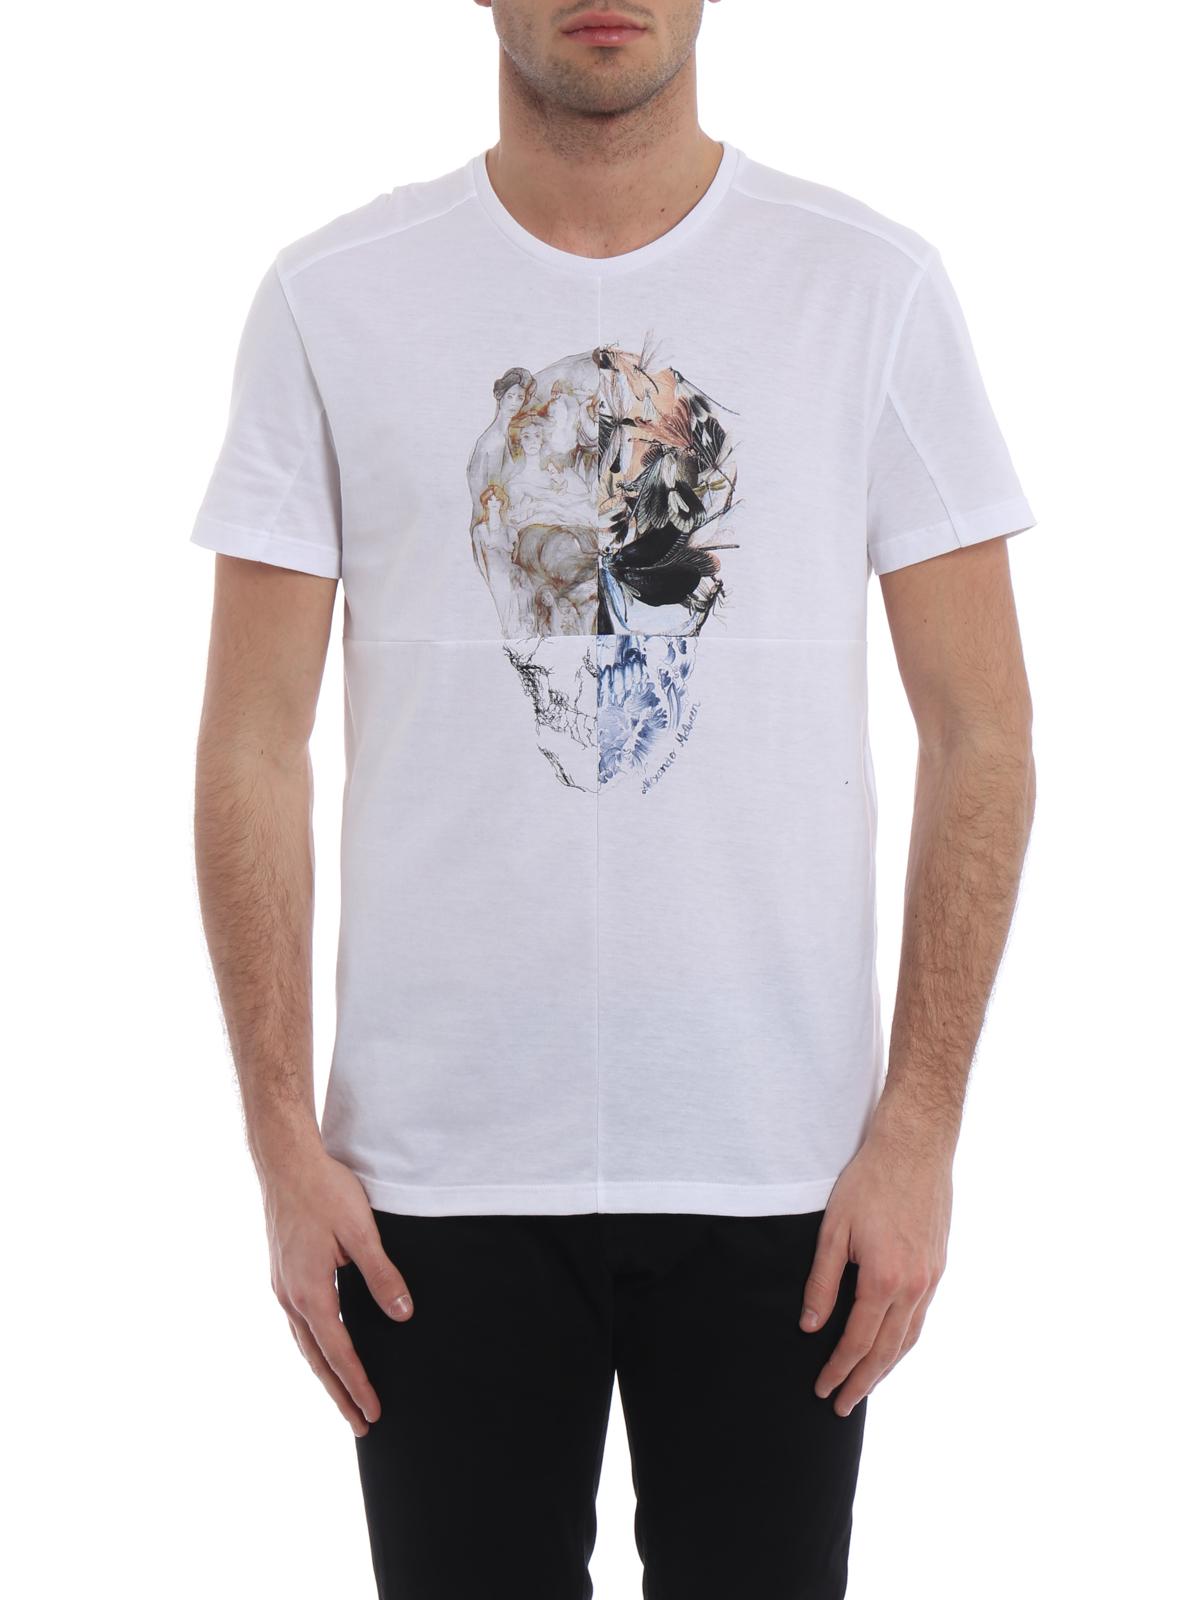 7445a9c16 iKRIX ALEXANDER MCQUEEN: t-shirts - Skull patchwork print white T-shirt